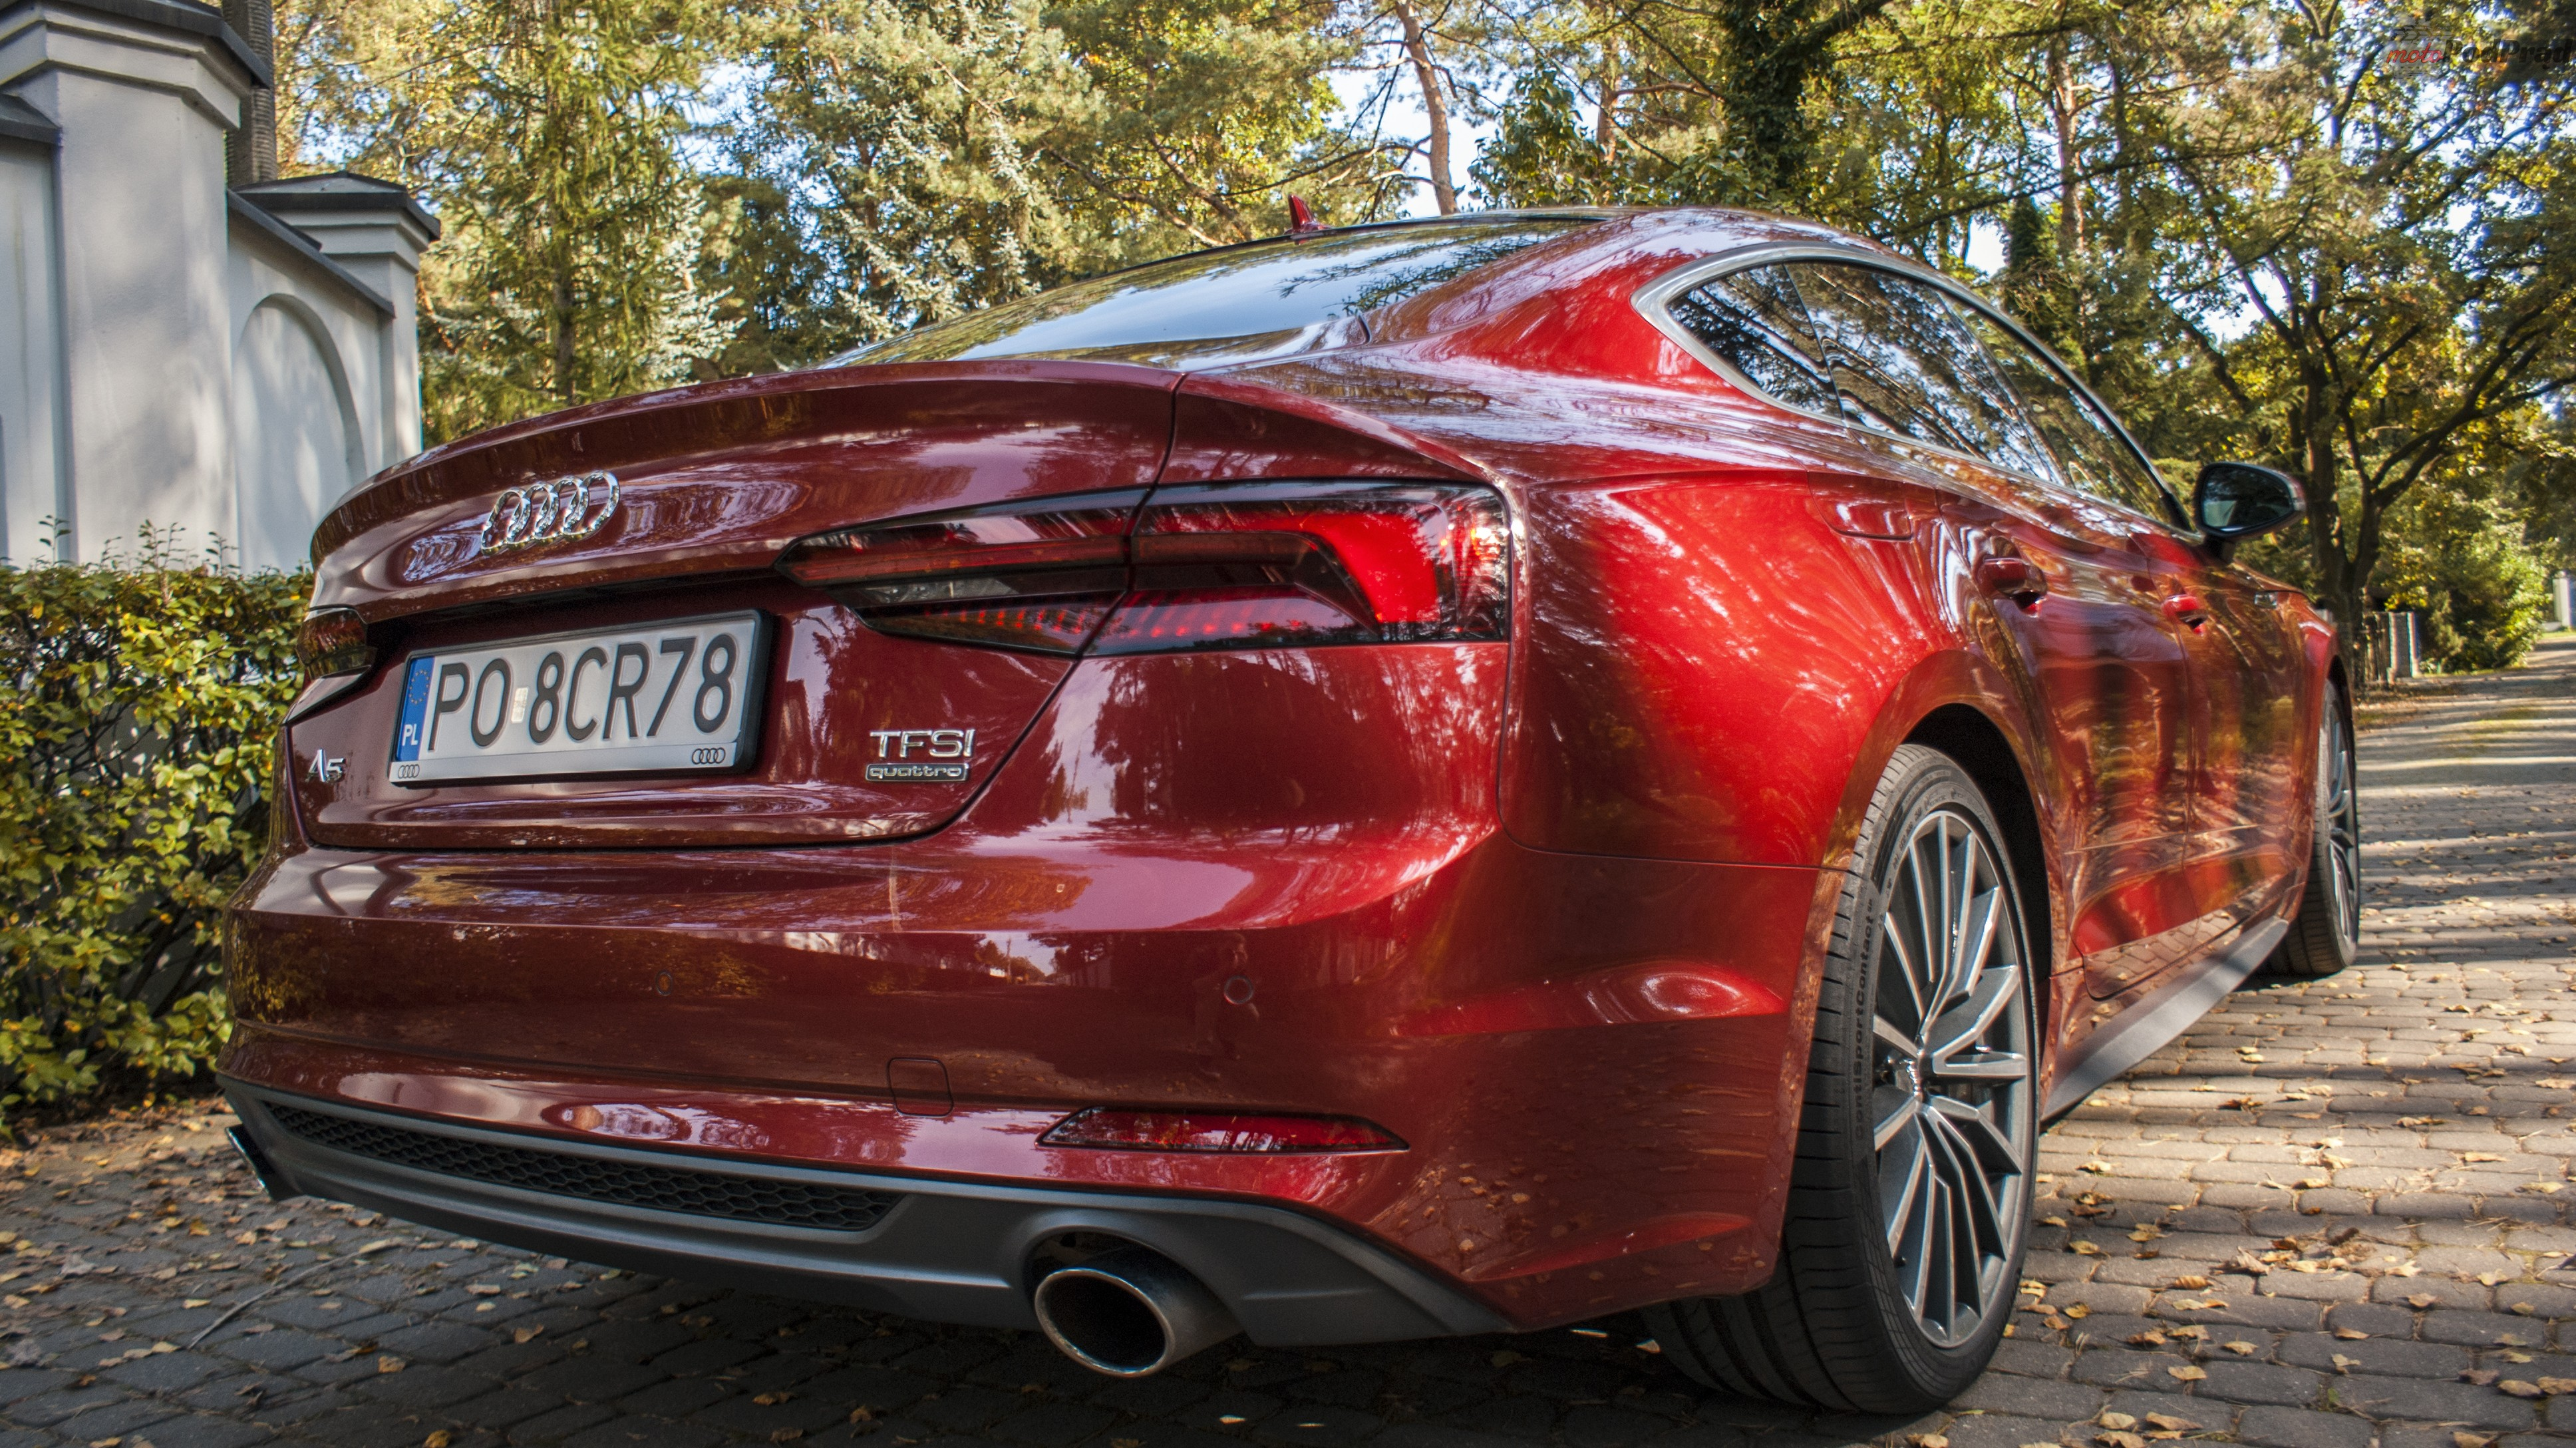 DSC01869 Minitest: Audi A5 Sportback 2.0 TFSI Quattro   Kwestia opakowania.